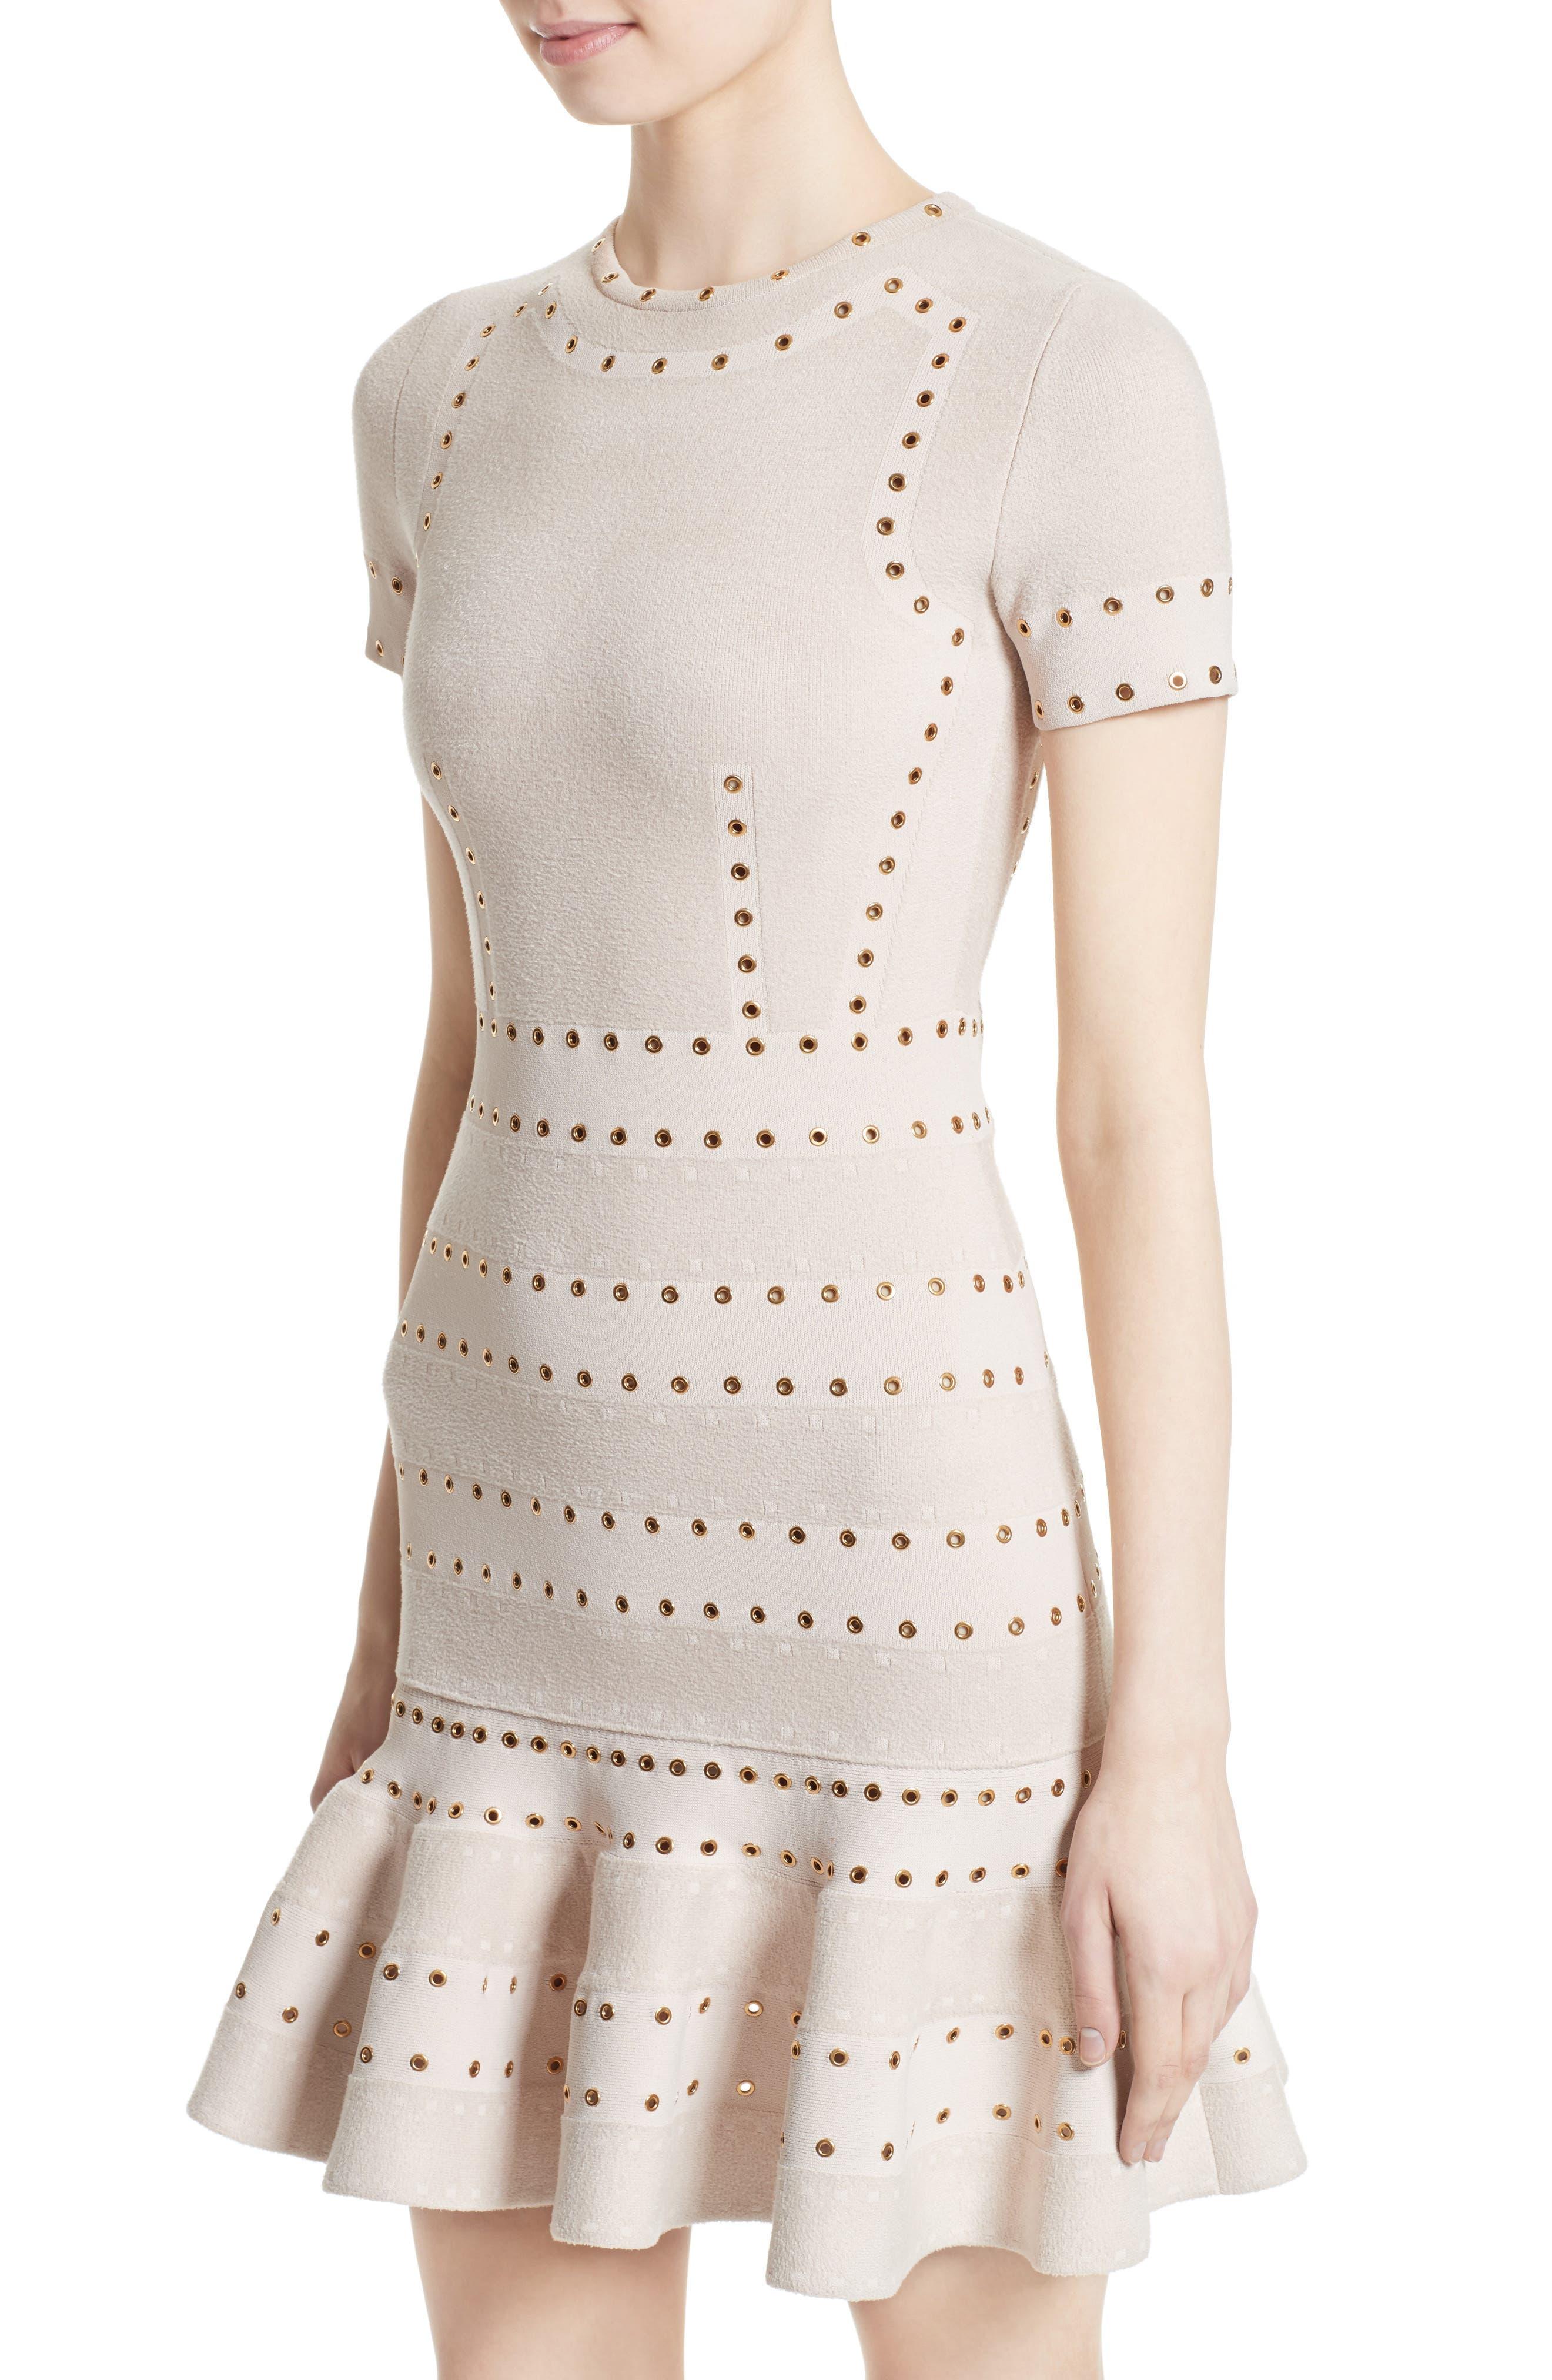 Eyelet Detail Knit Dress,                             Alternate thumbnail 4, color,                             900